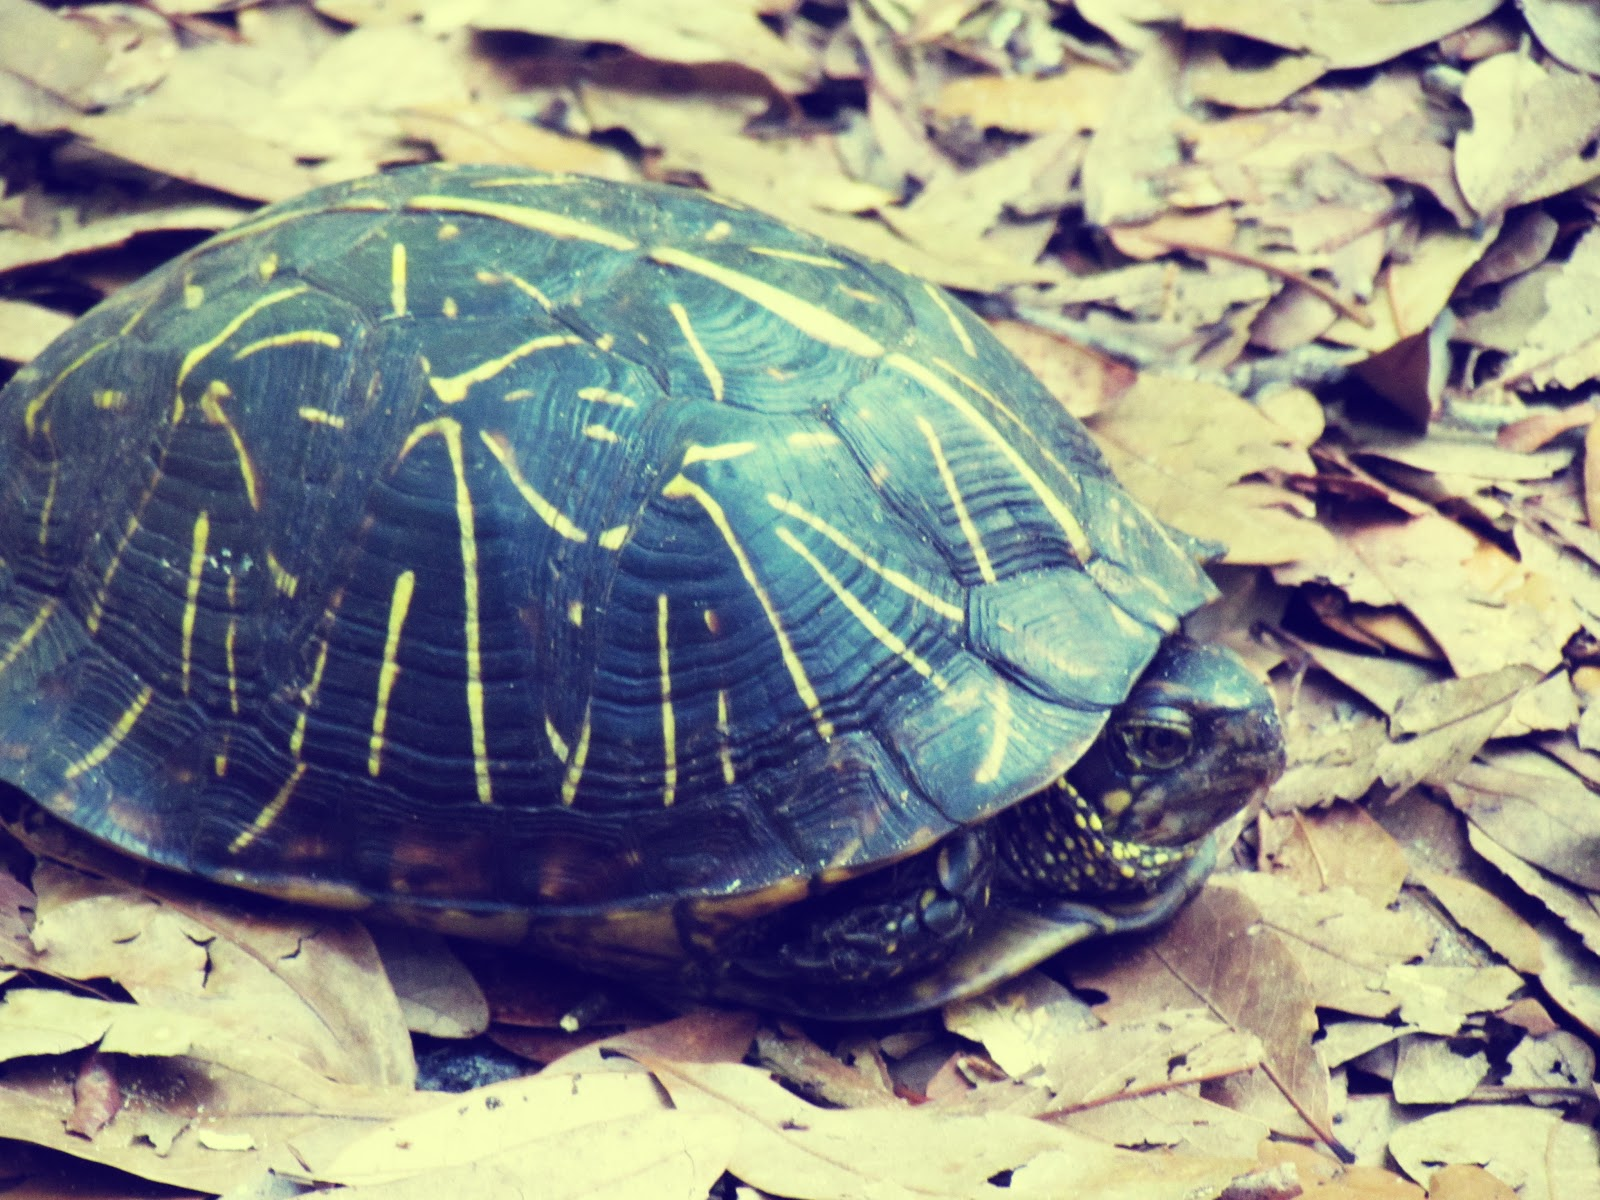 A yellow-bellied slider tortoise in Florida's Hammock Park in Dunedin, Florida